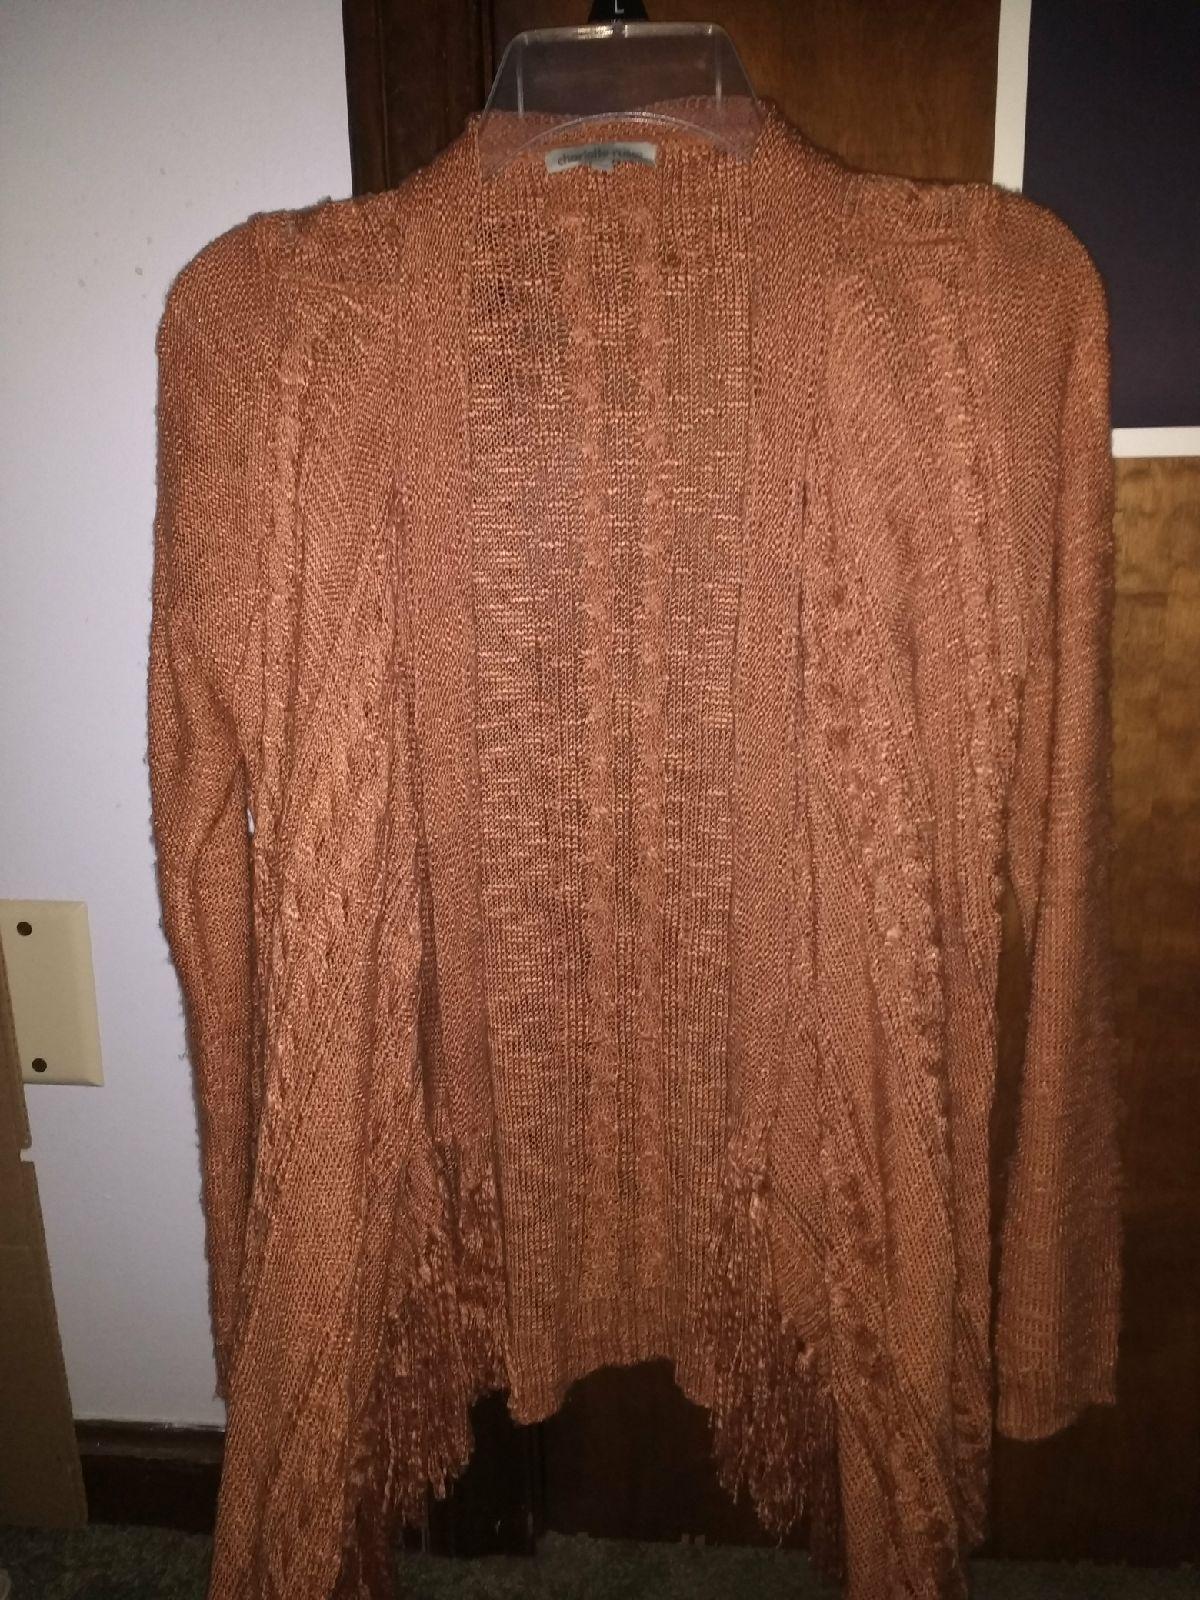 Burnt orange knit cardigan - Mercari: BUY & SELL THINGS YOU LOVE